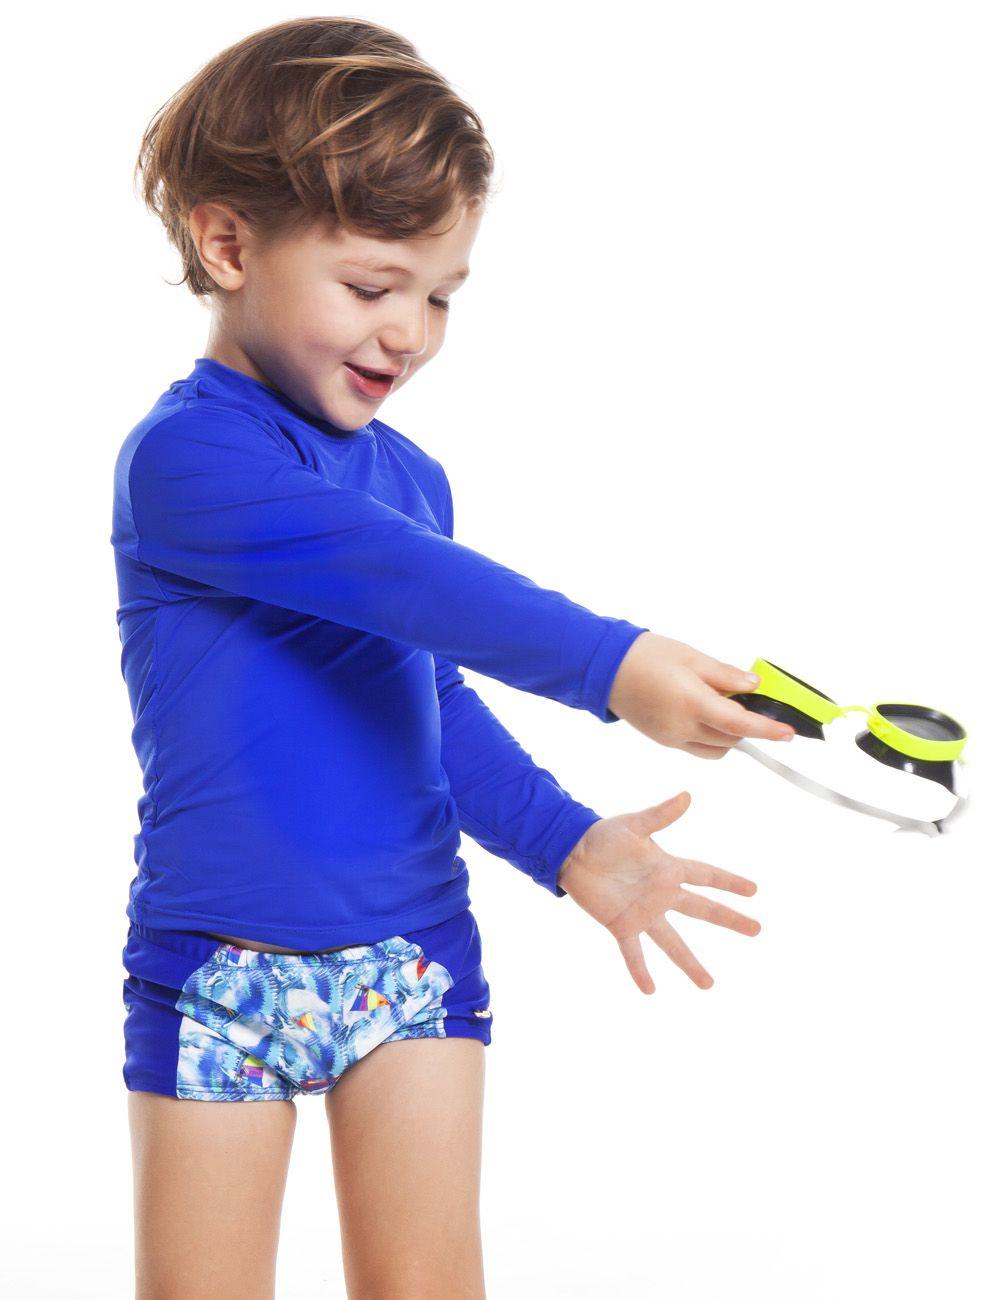 71afe4b192166 Blusa Proteção UV Infantil Unissex - Camboriú